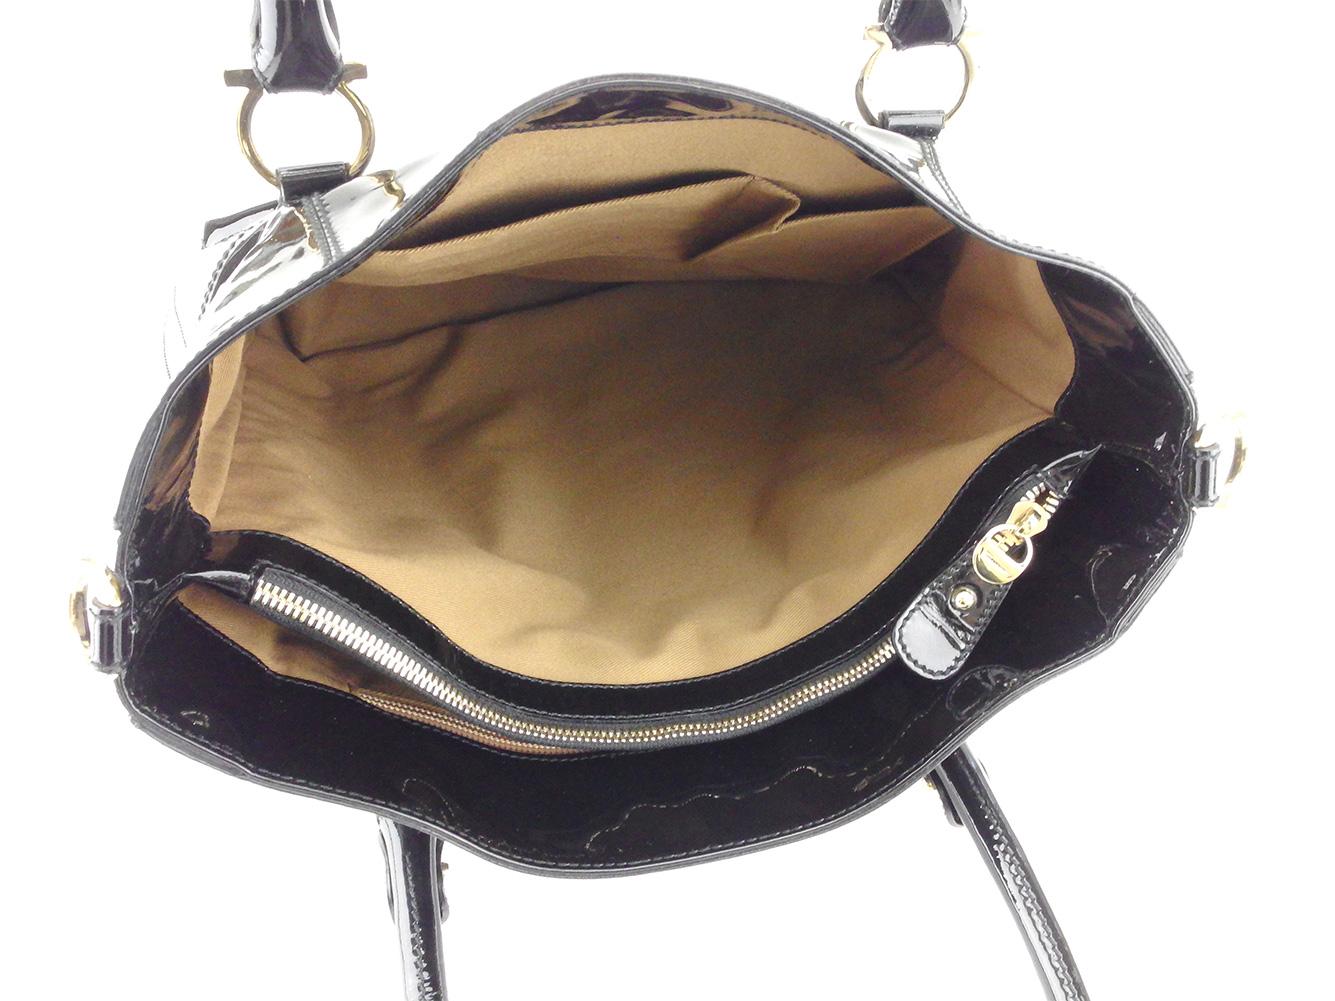 ae8c2a269fe4 ... フェラガモSalvatoreFerragamoトートバッグトートハンドバッグレディースガンチーニブラックゴールドエナメル人気良品 ?財布 ?